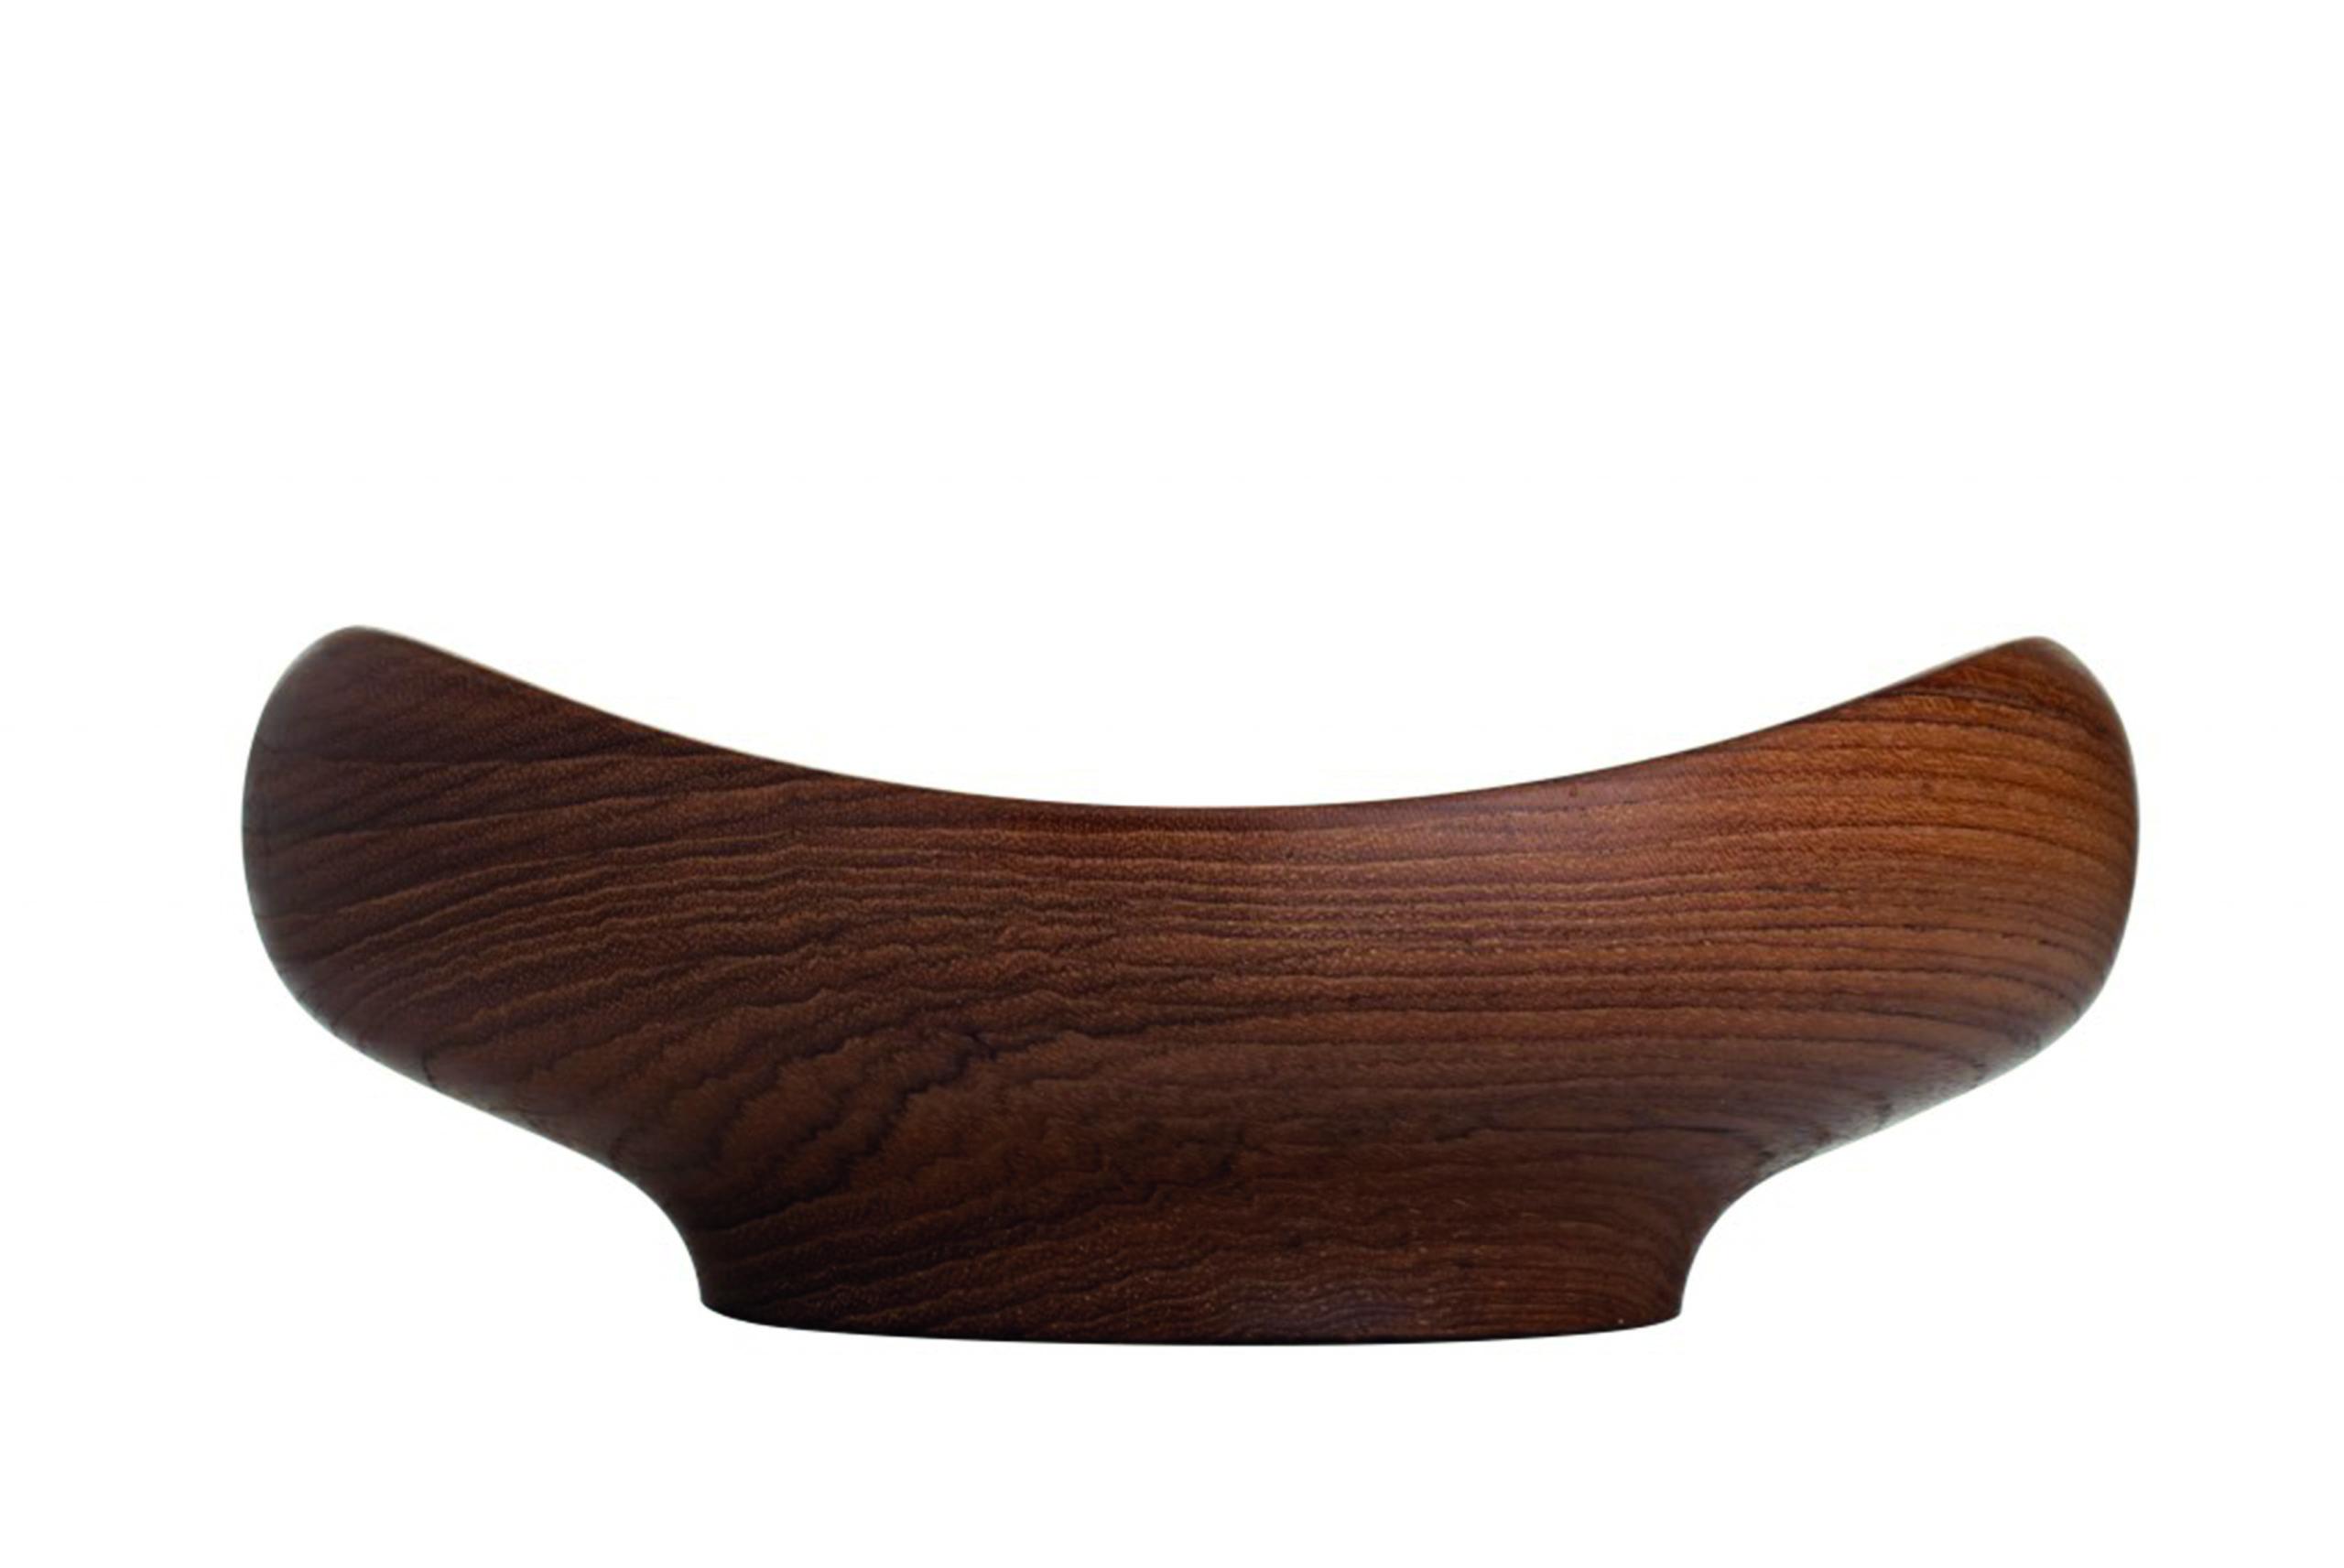 Architectmade-FJ-Bowl-15-Teak-Finn-Juhl-1